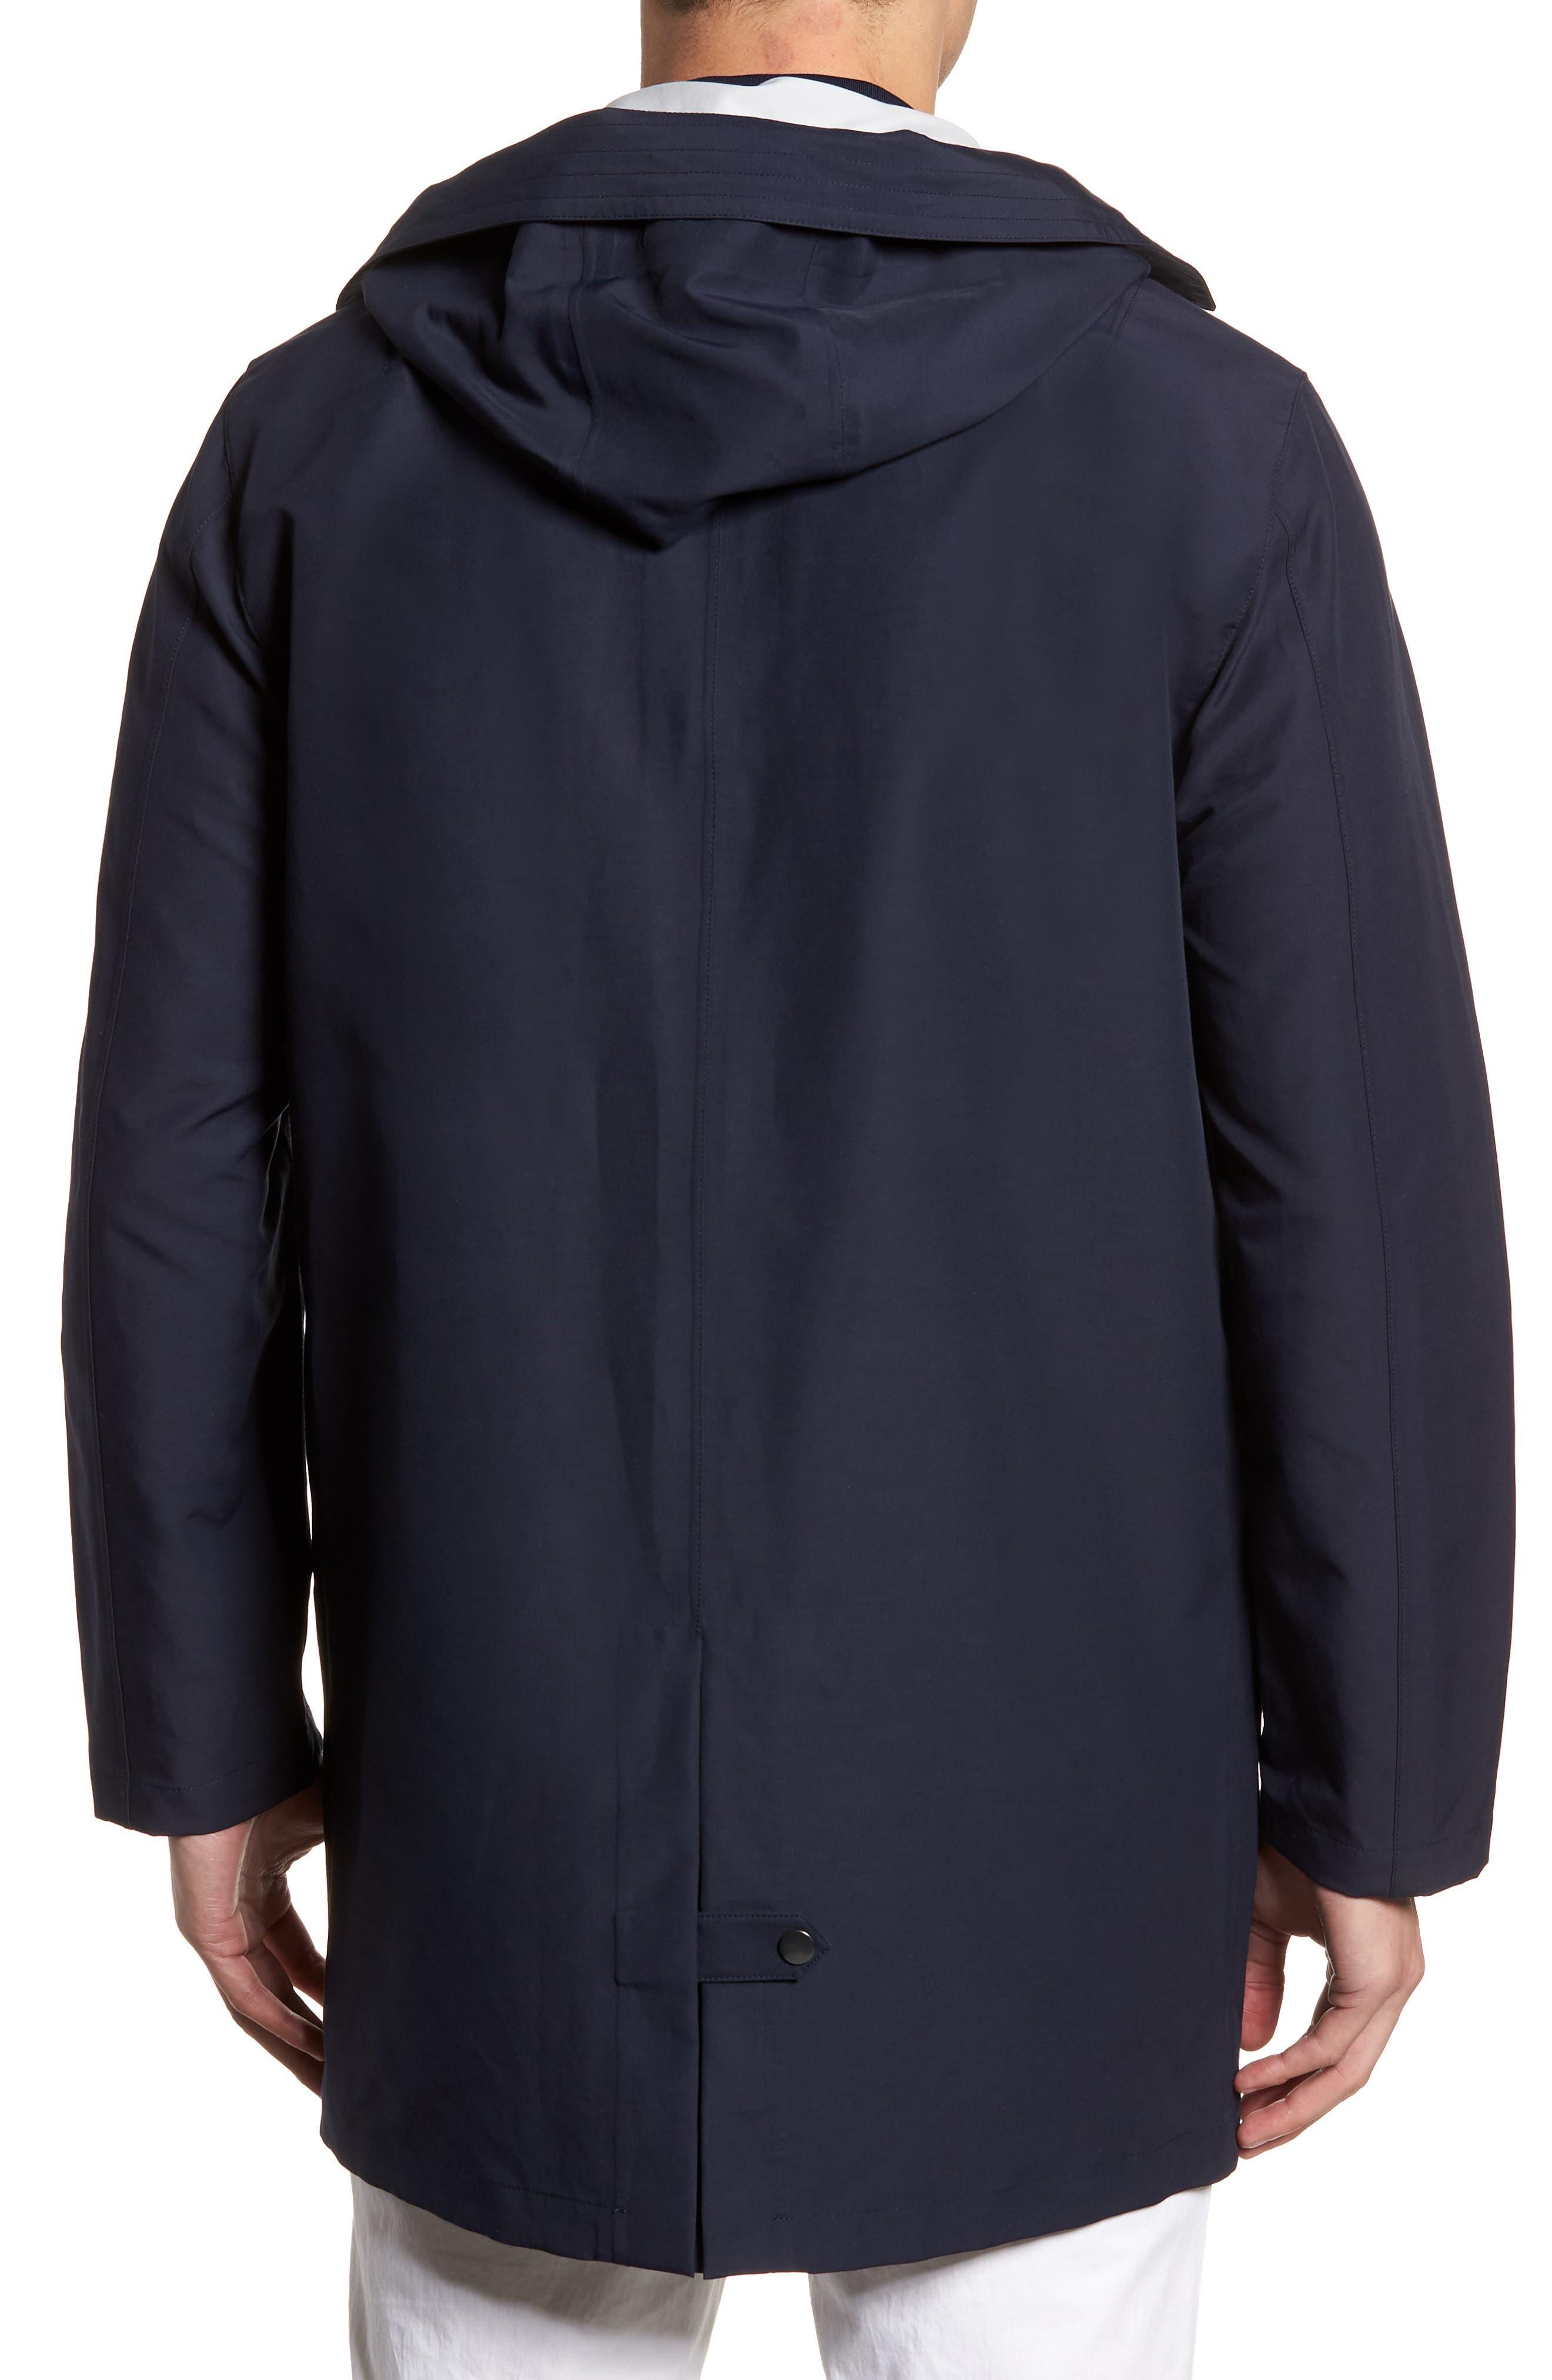 Bonded Cotton Blend Rain Jacket,                             Alternate thumbnail 2, color,                             NAVY